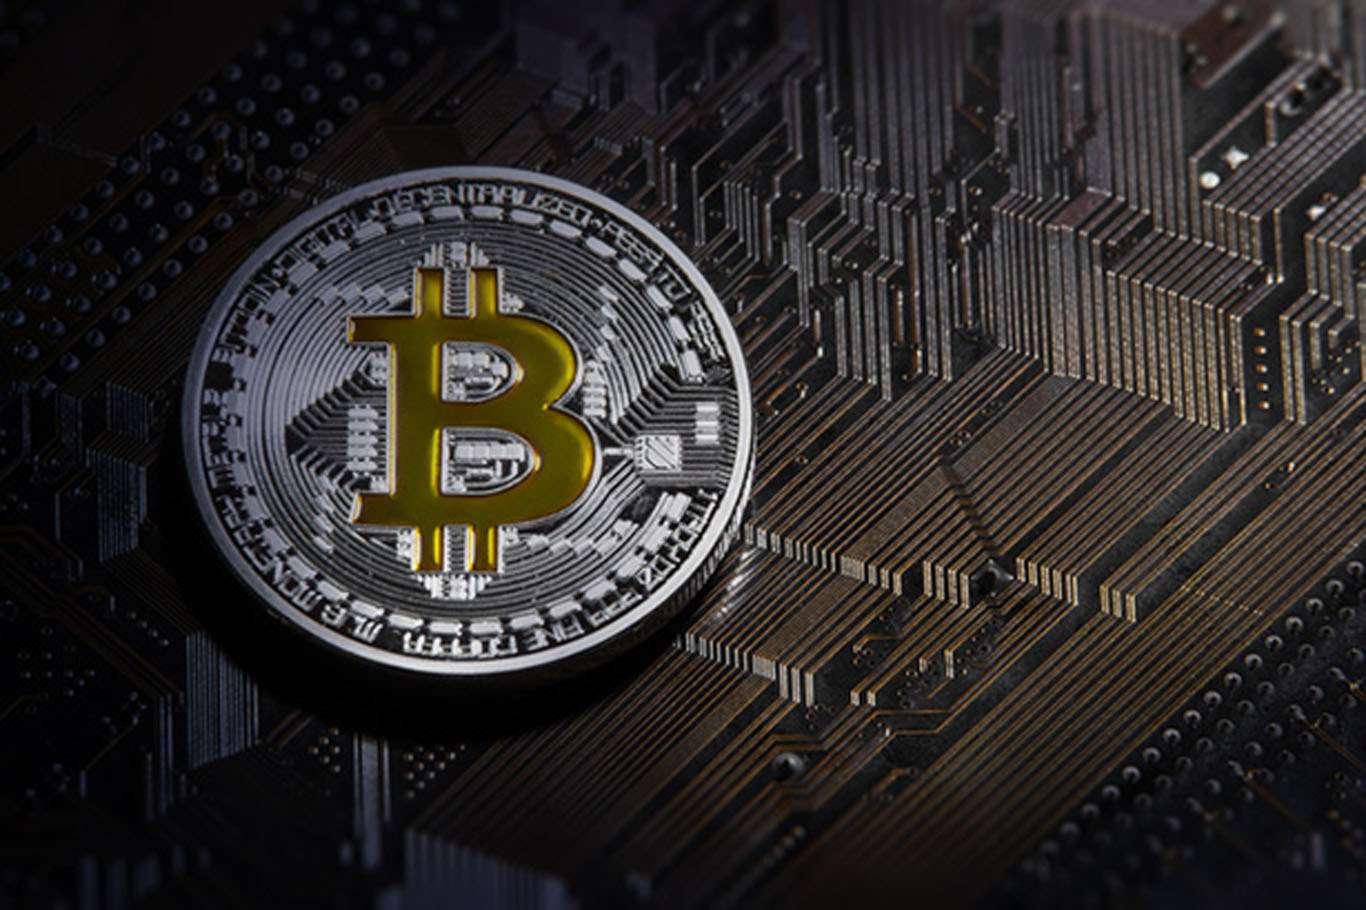 Kripto para borsası Thodex